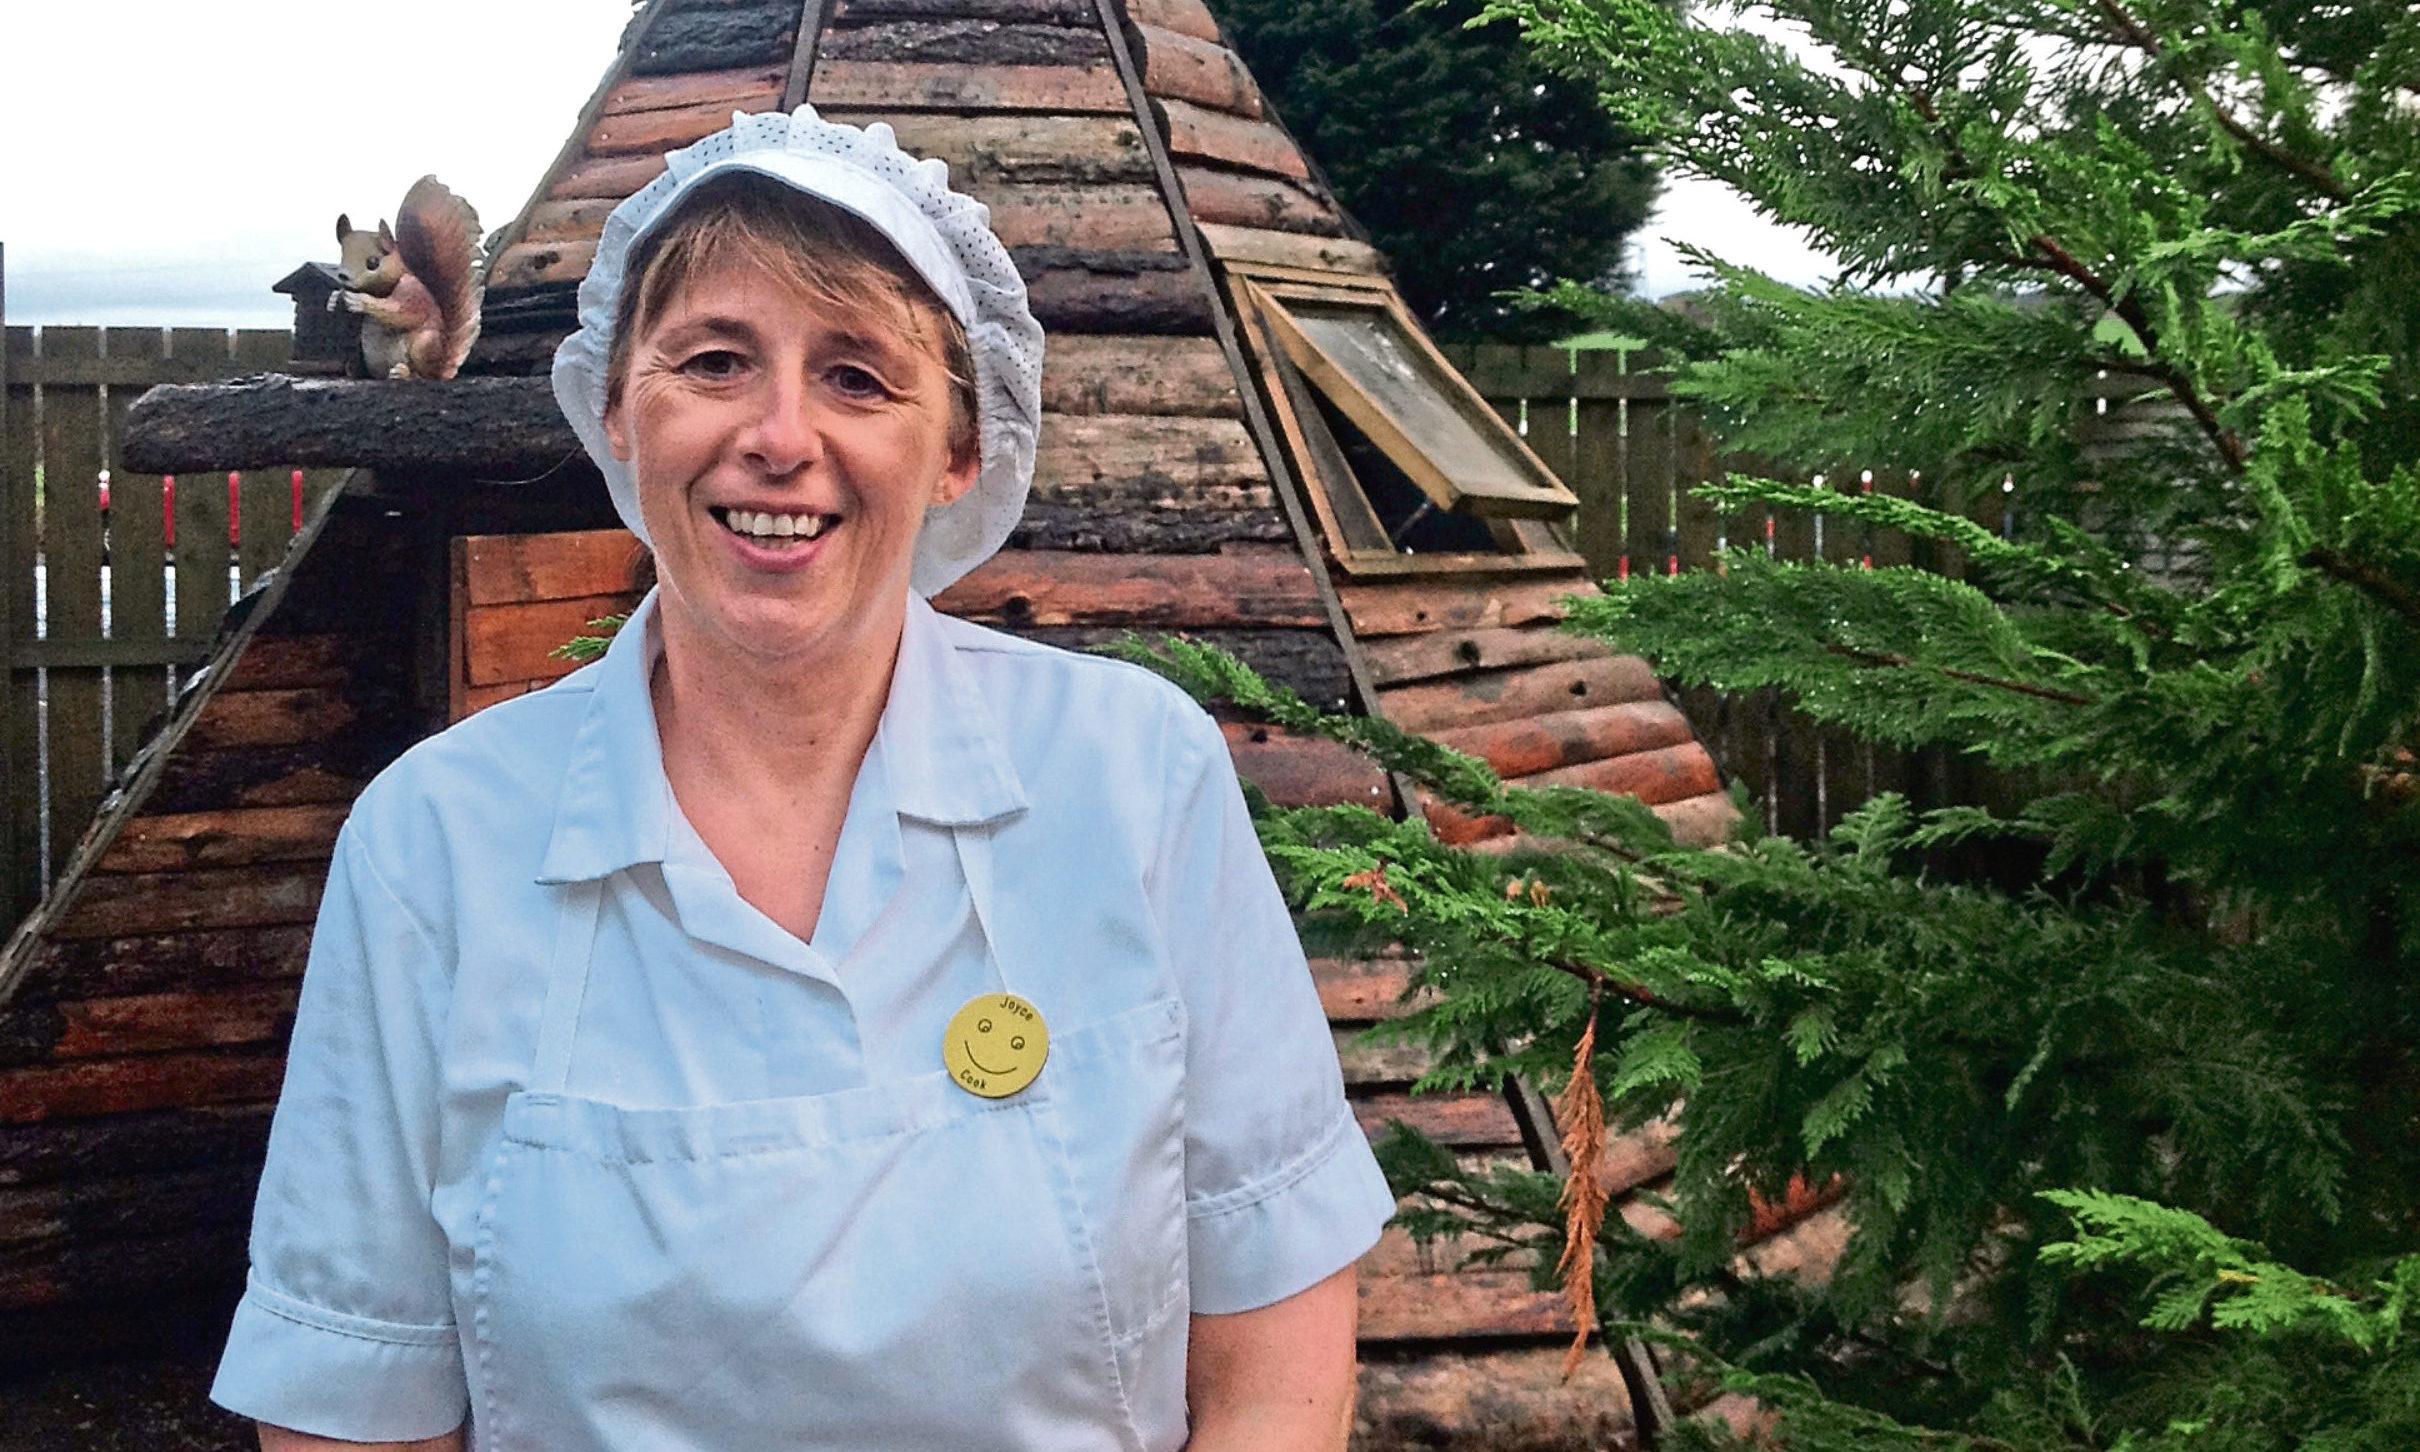 Nursery cook Joyce Welsh